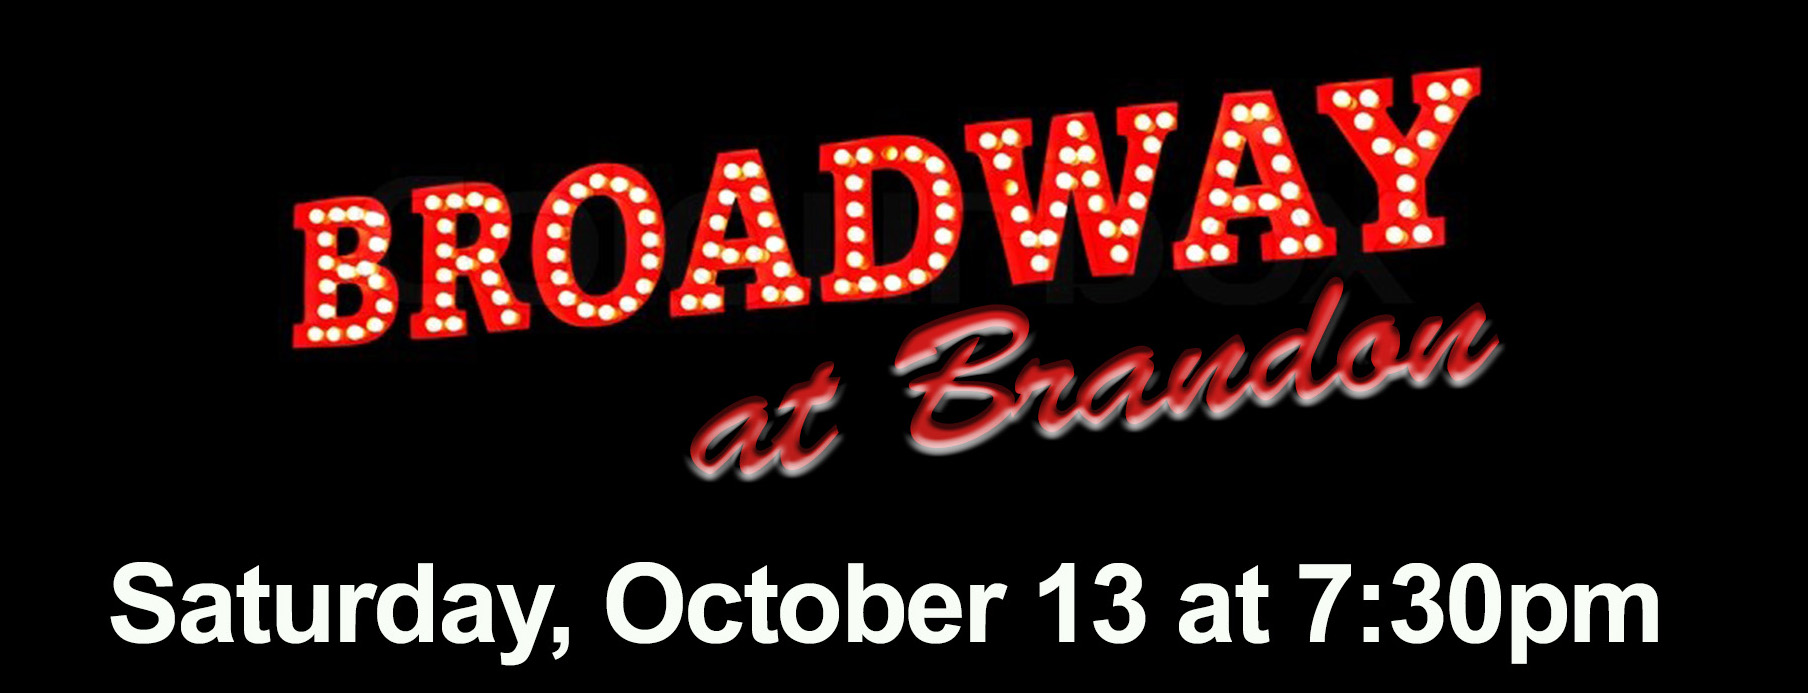 Broadway at Brandon First Presbyterian Church October 13, 2018